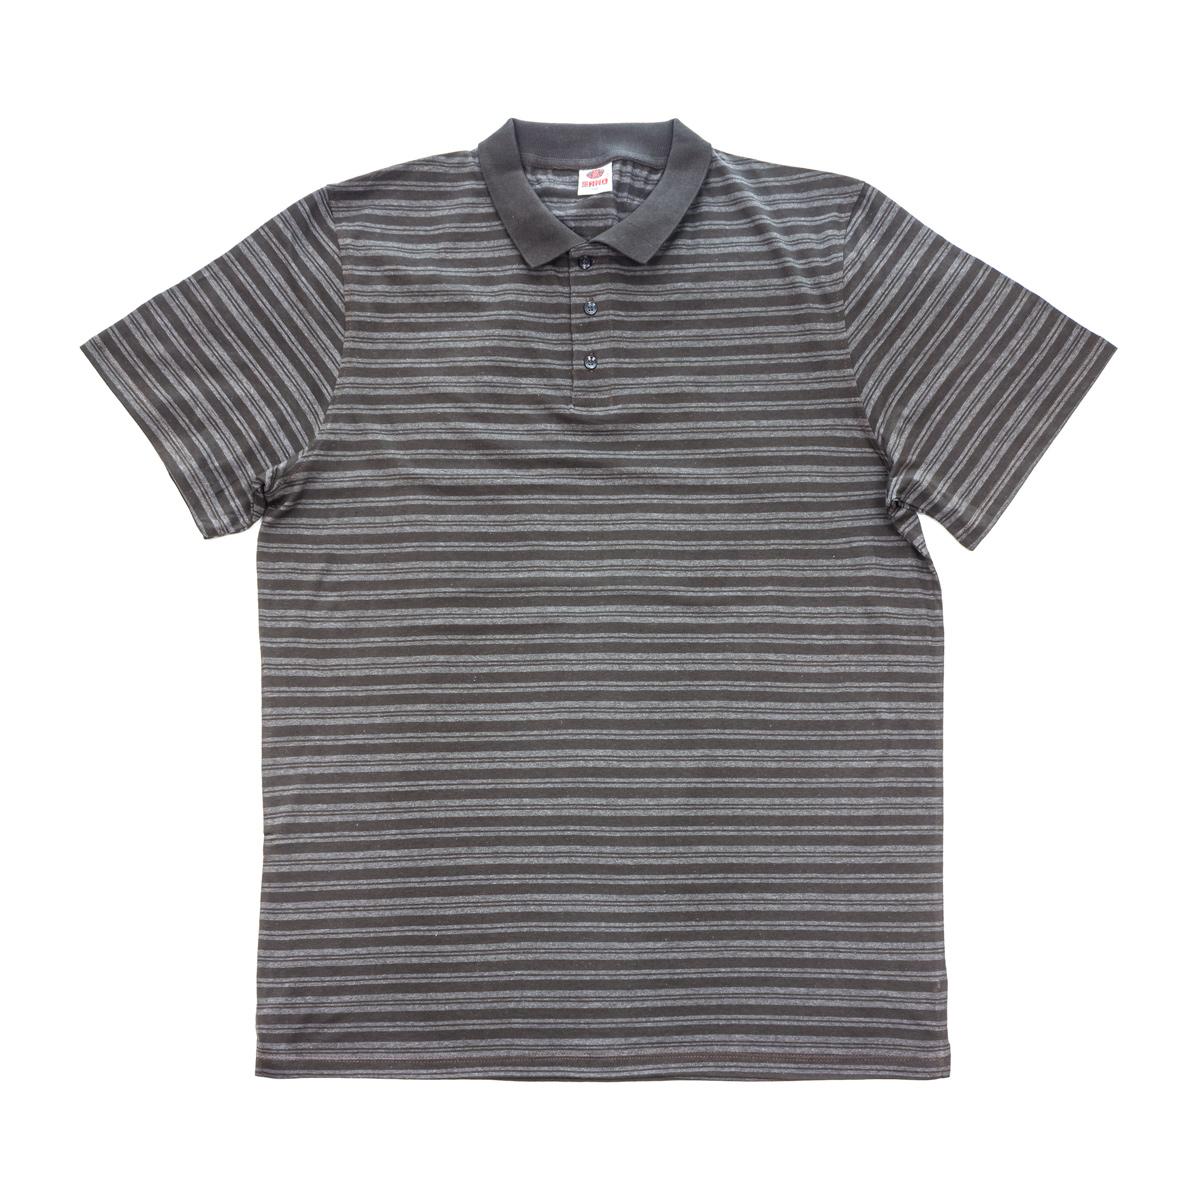 Муж. футболка арт. 04-0046 Кофейный р. 62 - Мужская одежда артикул: 25690